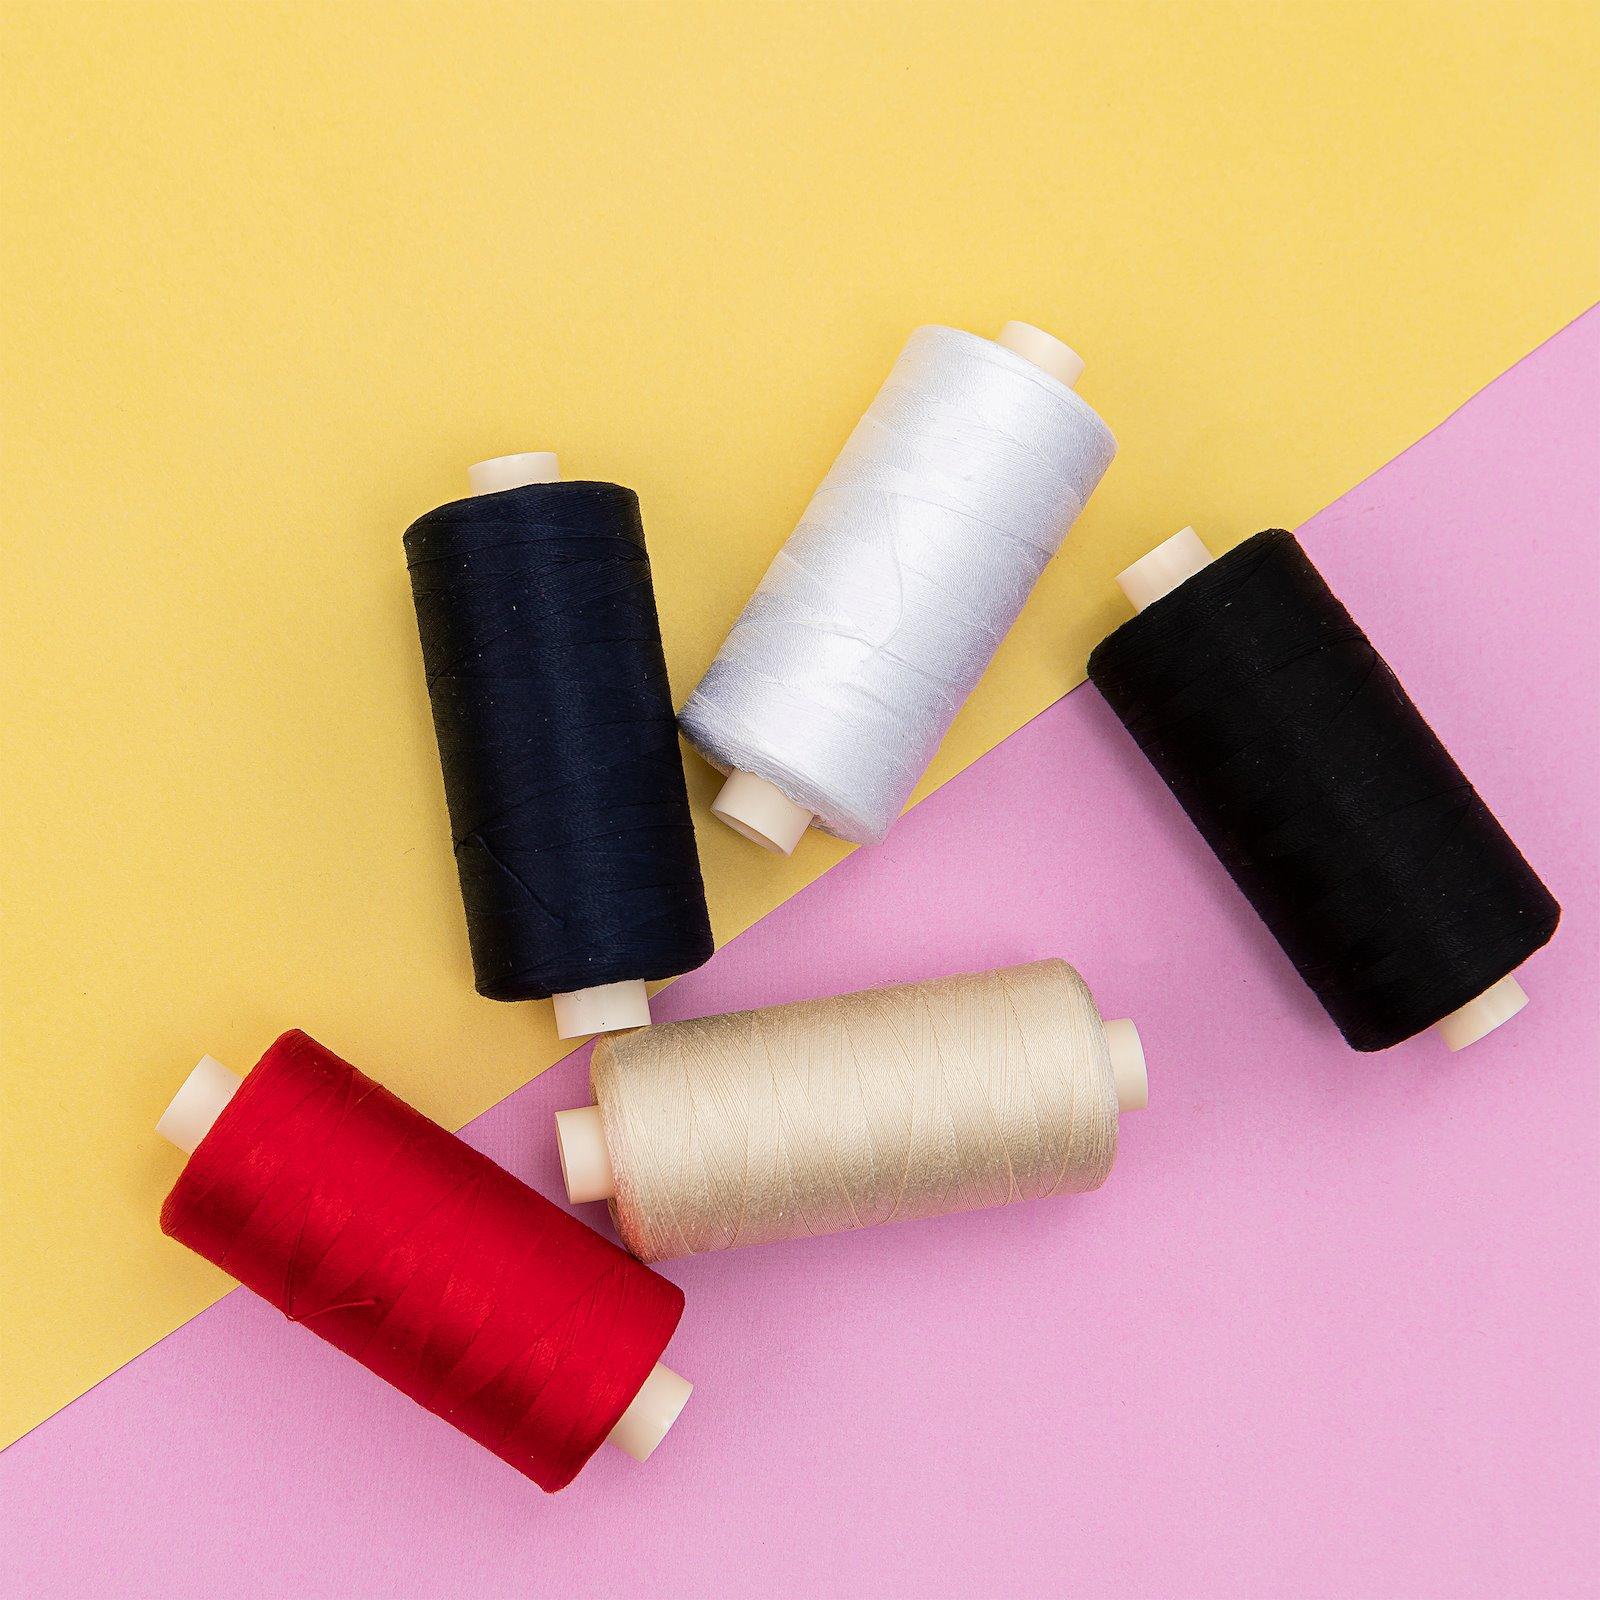 Sewing thread cotton navy 1000m 14011_14023_14001_14002_14043_bundle